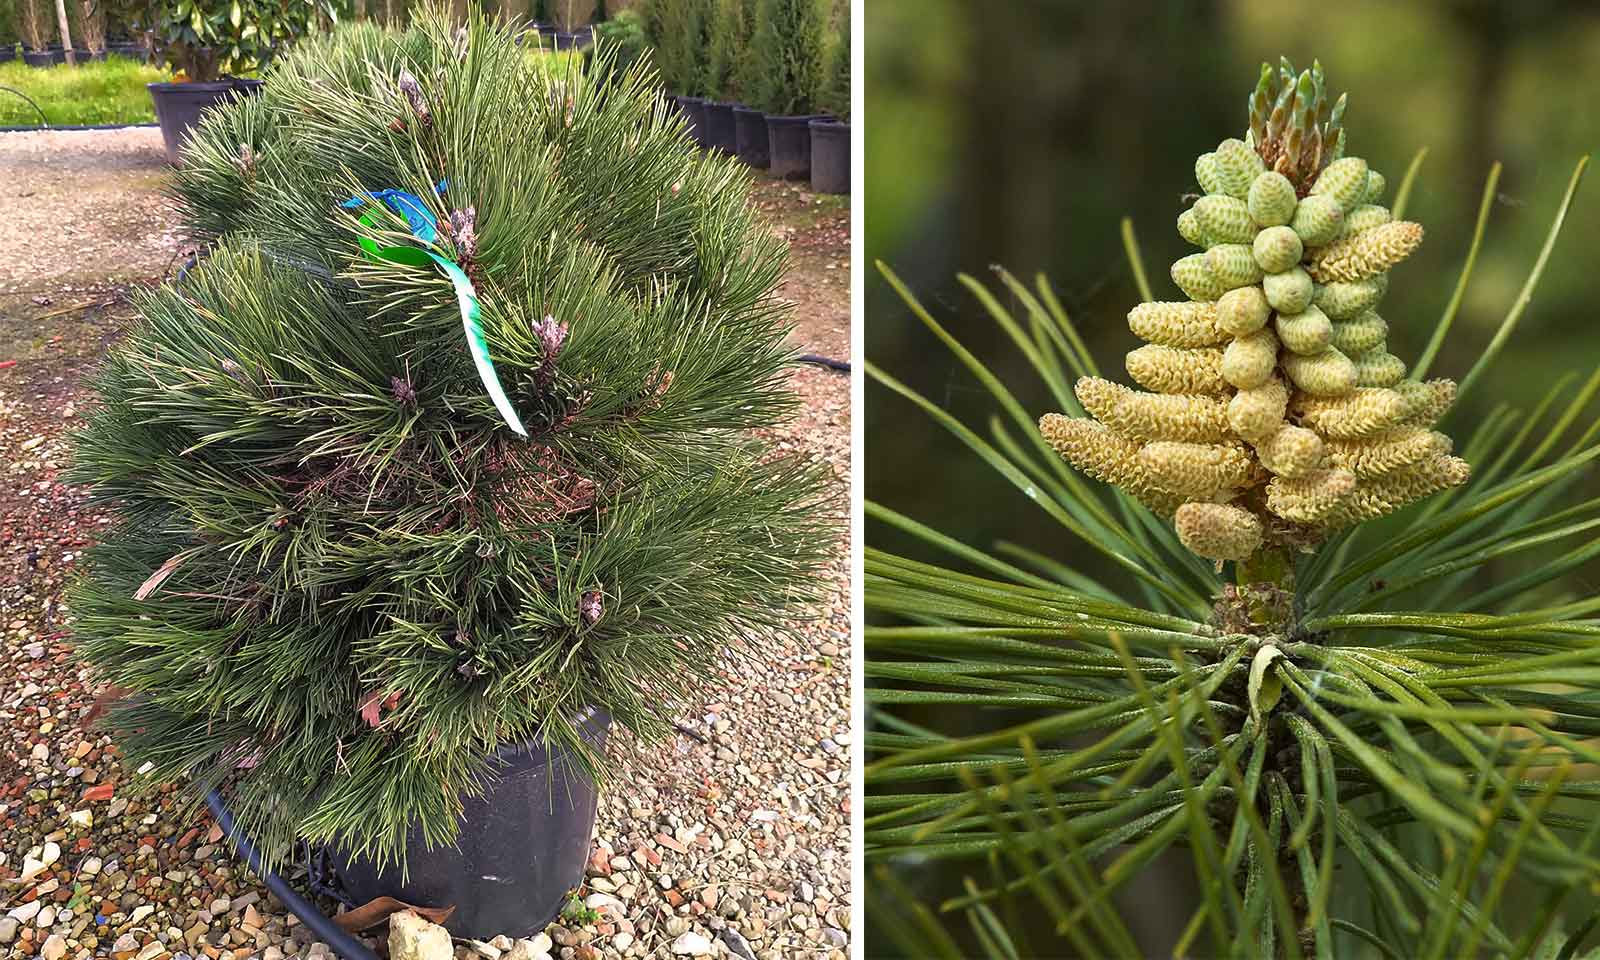 Pinus Nigra Austriaca 'Nana' (Dwarf Austrian Pine, Black Pine 'Nana')